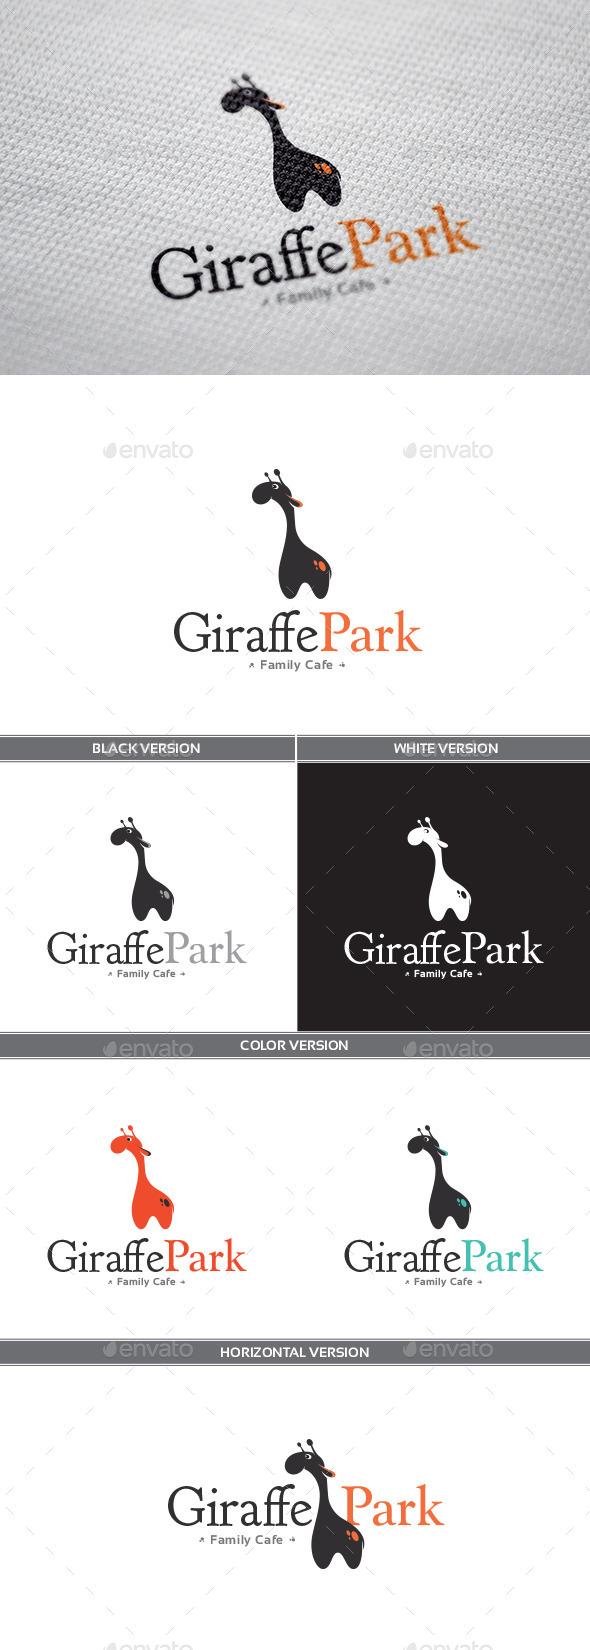 GraphicRiver GiraffePark Logo 9324708